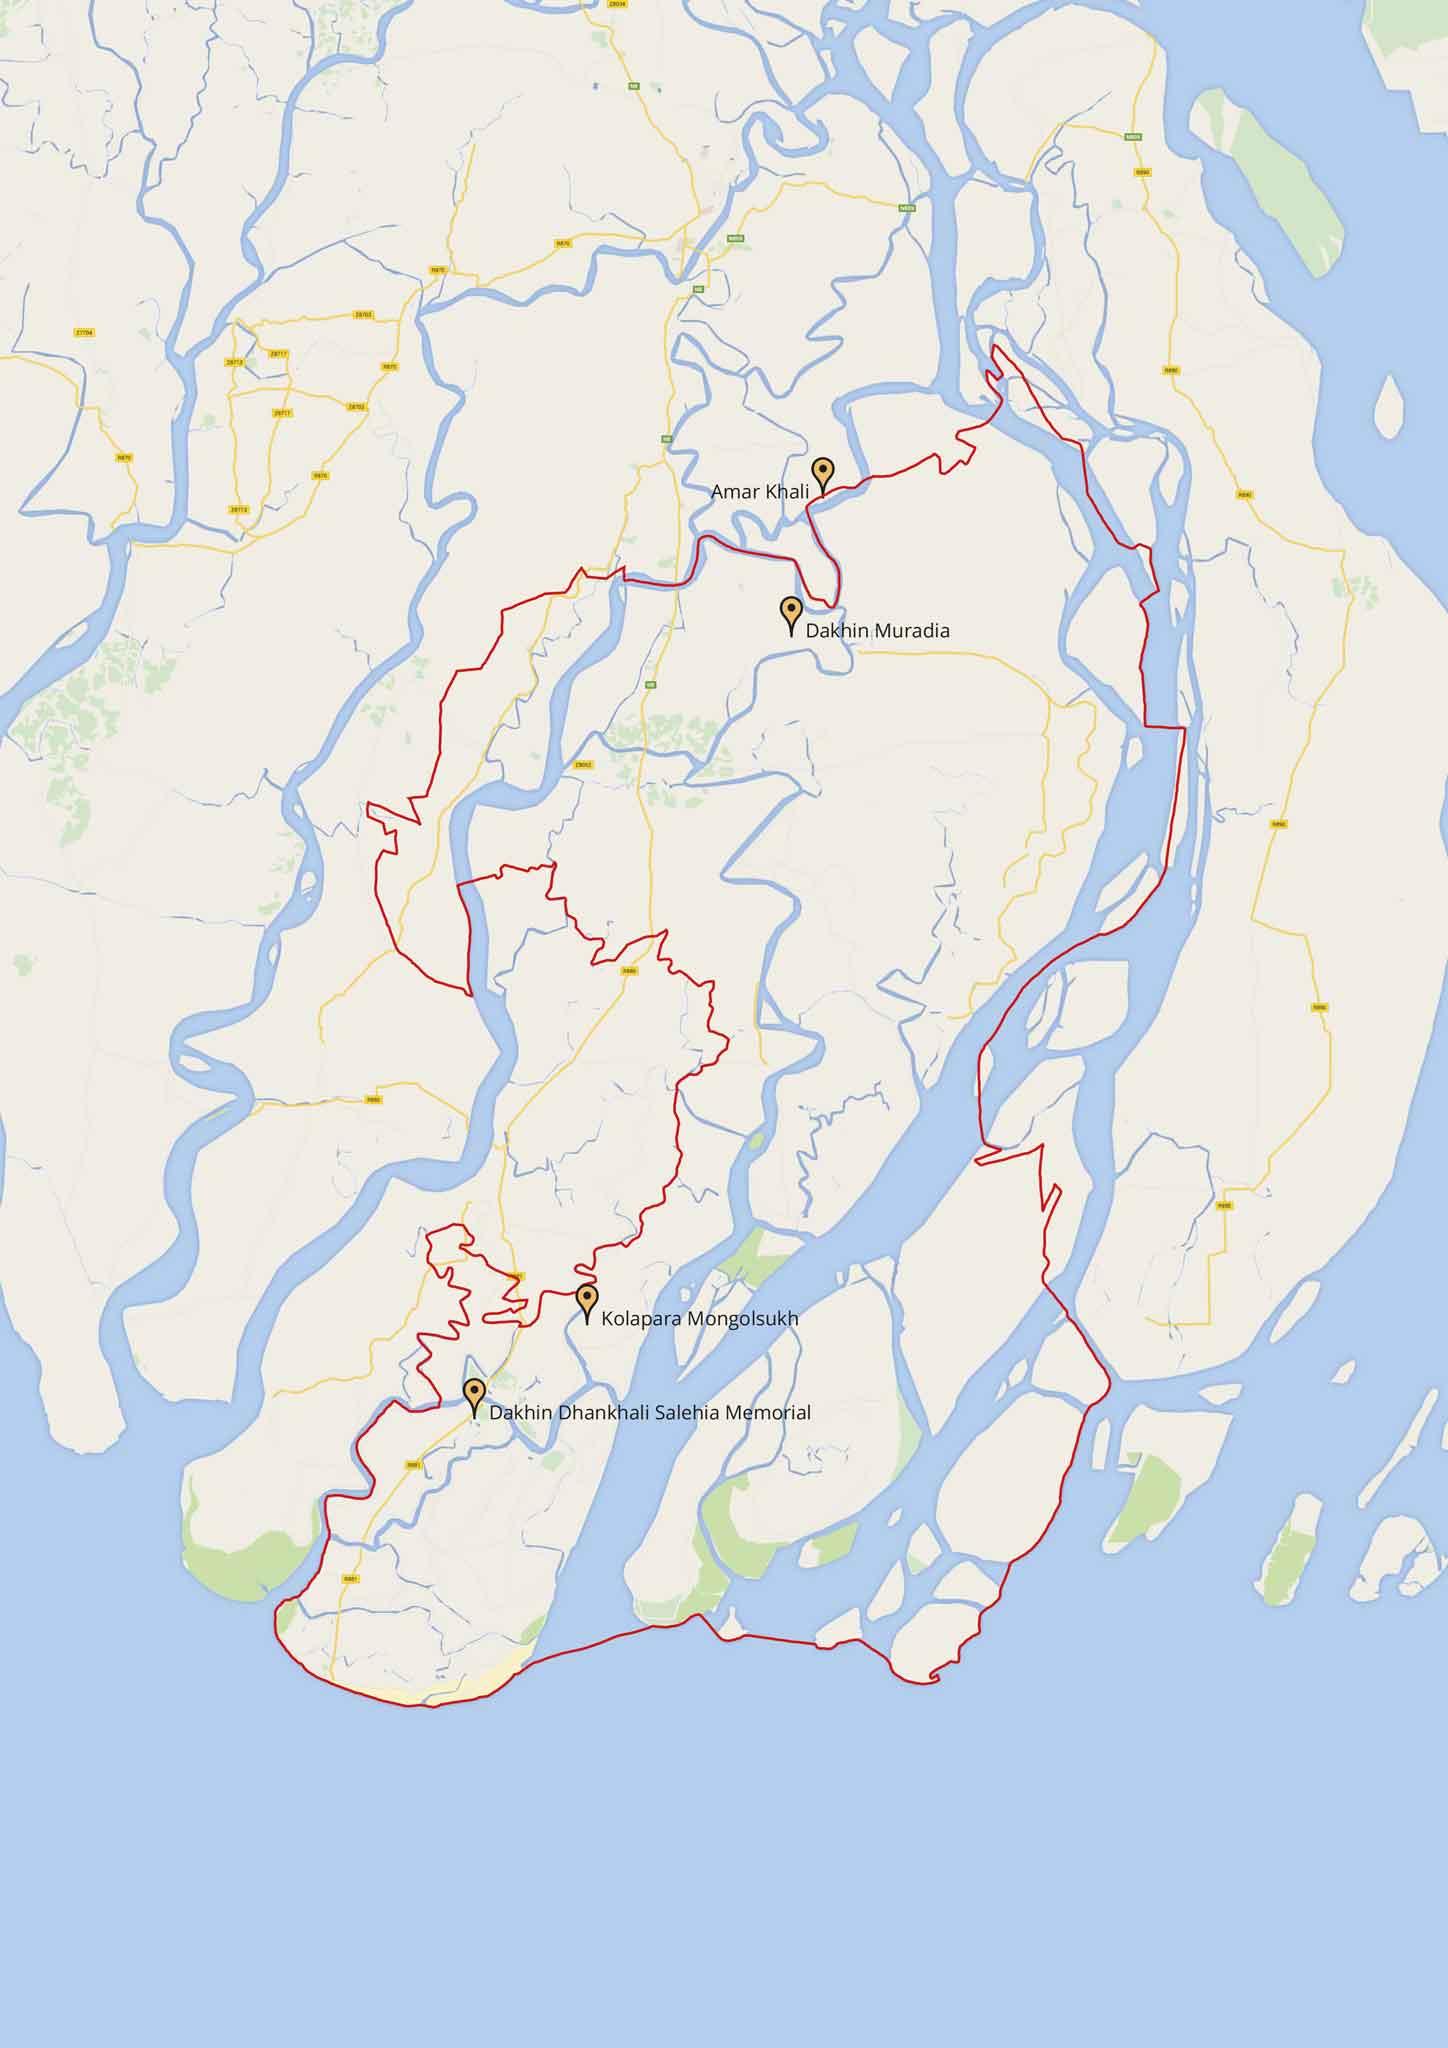 Sites visited